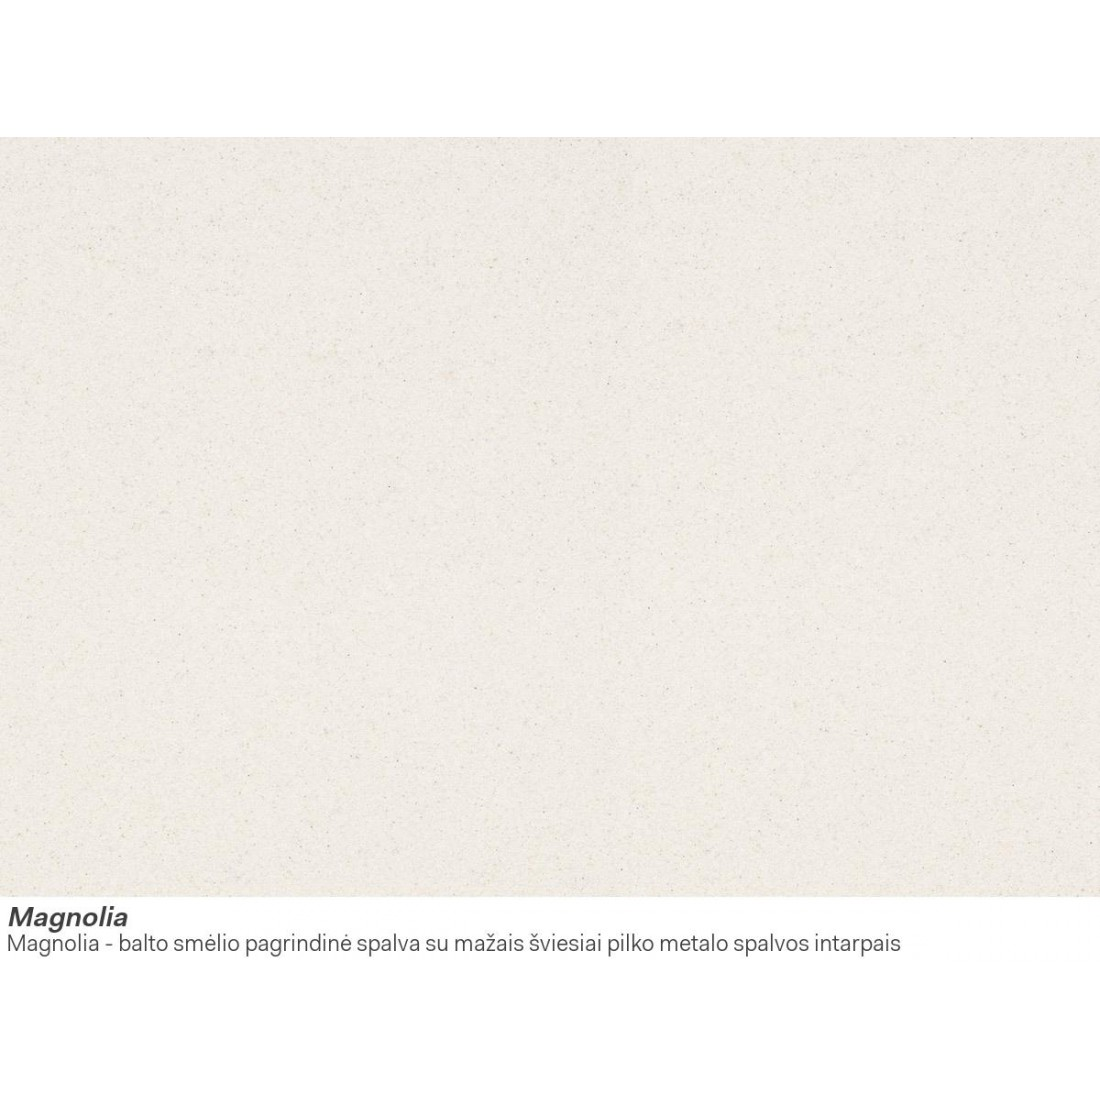 Akmens masės plautuvė Franke Maris MRG 611-100, Magnolia